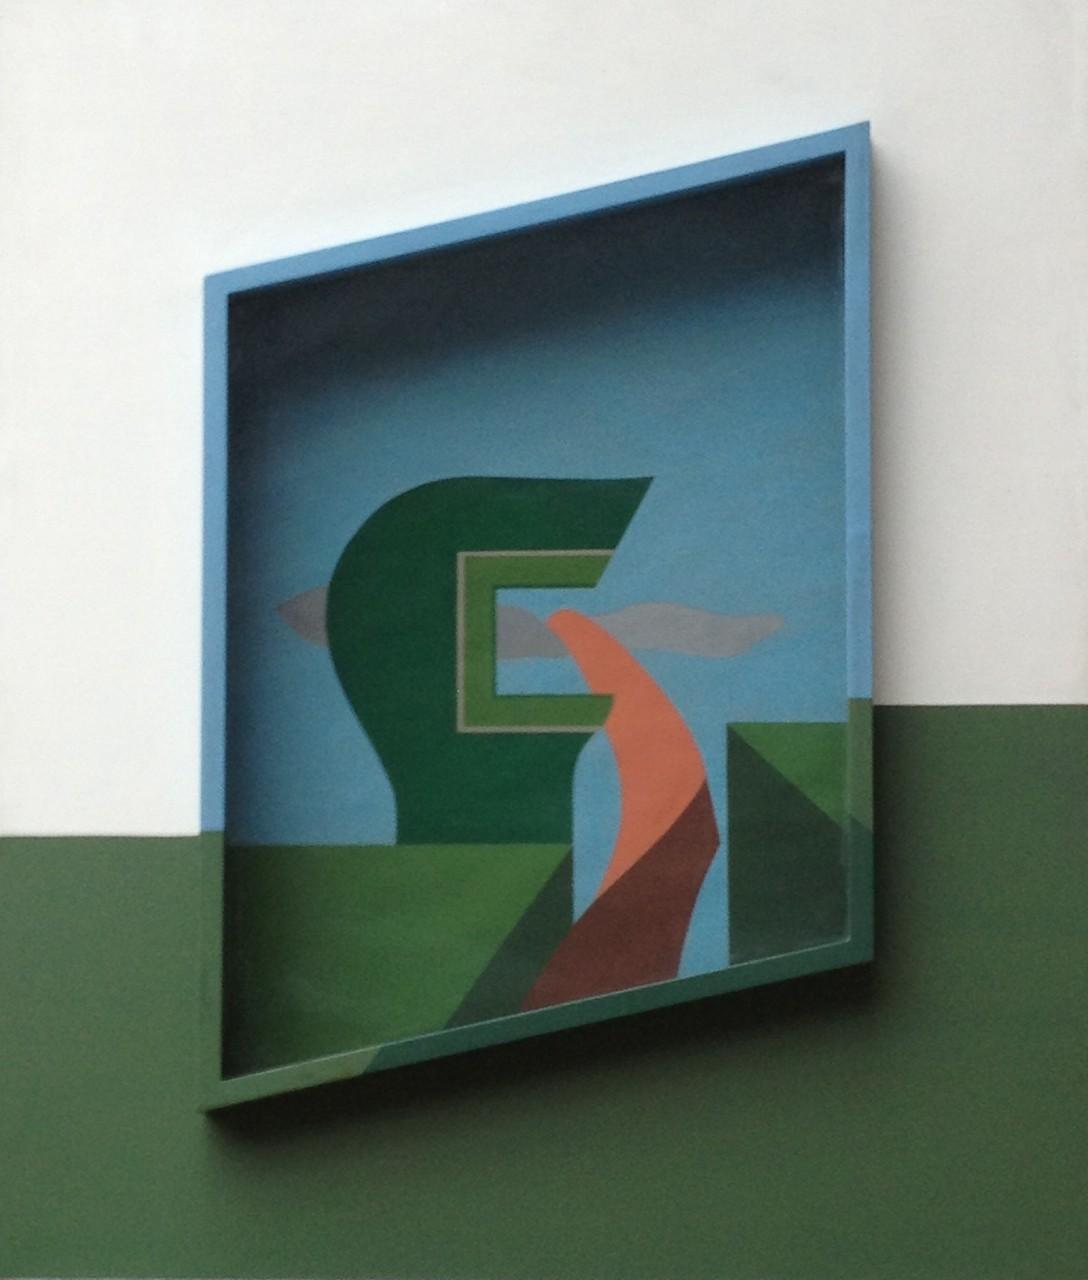 Orange aktiv, Holzkasten verglast, Gouache, 90 x 75 x 10 cm, 1974 (#604)